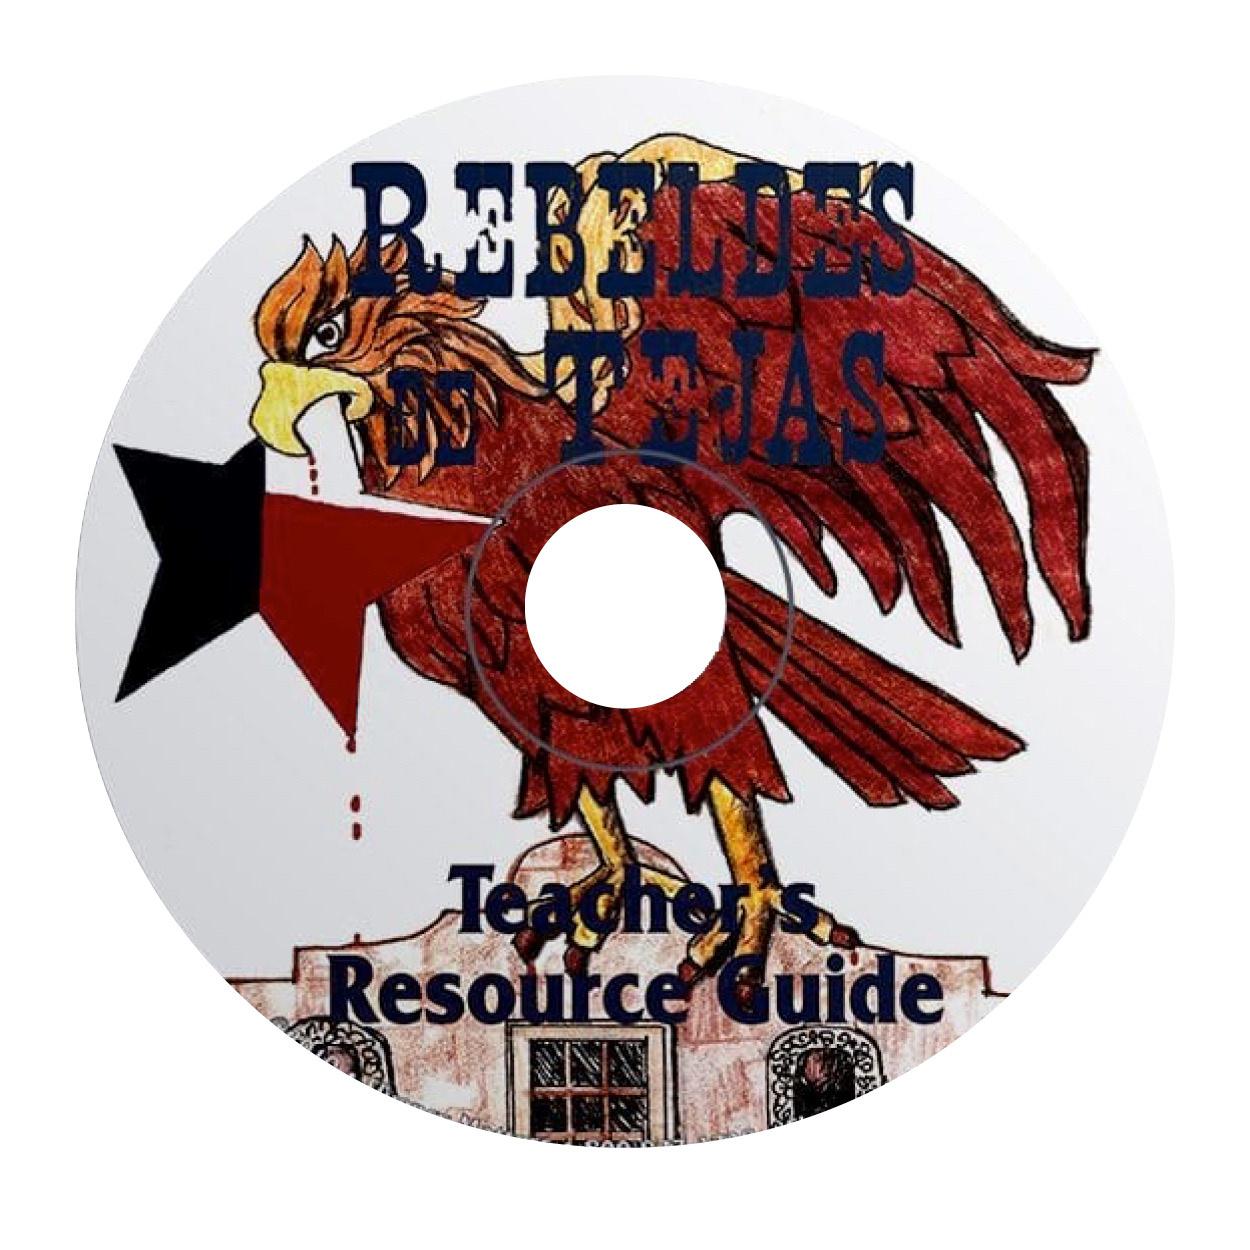 Rebeldes de Tejas - Teacher's Guide on CD